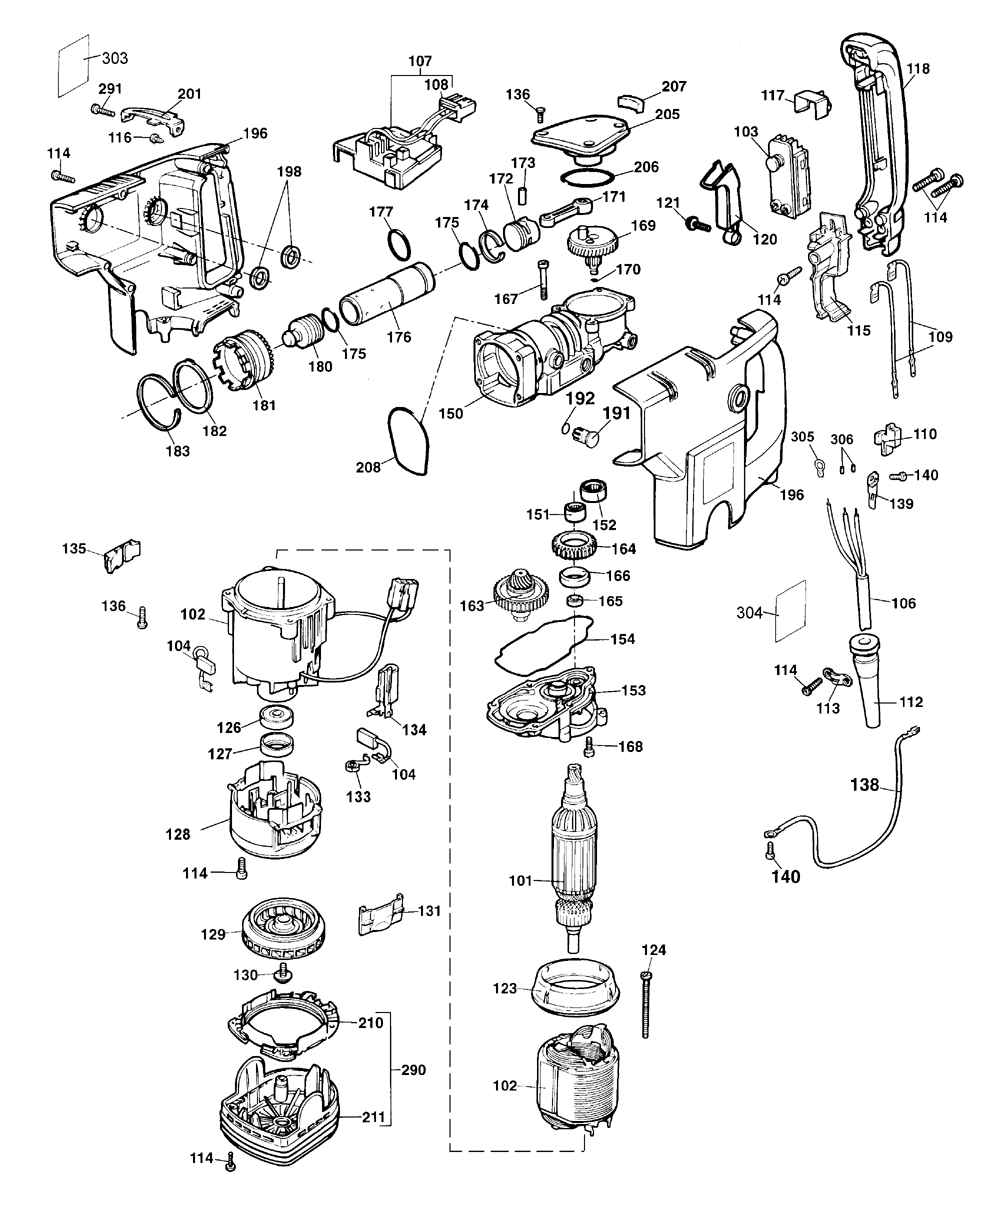 DW530K-Dewalt-T103-PB-1Break Down